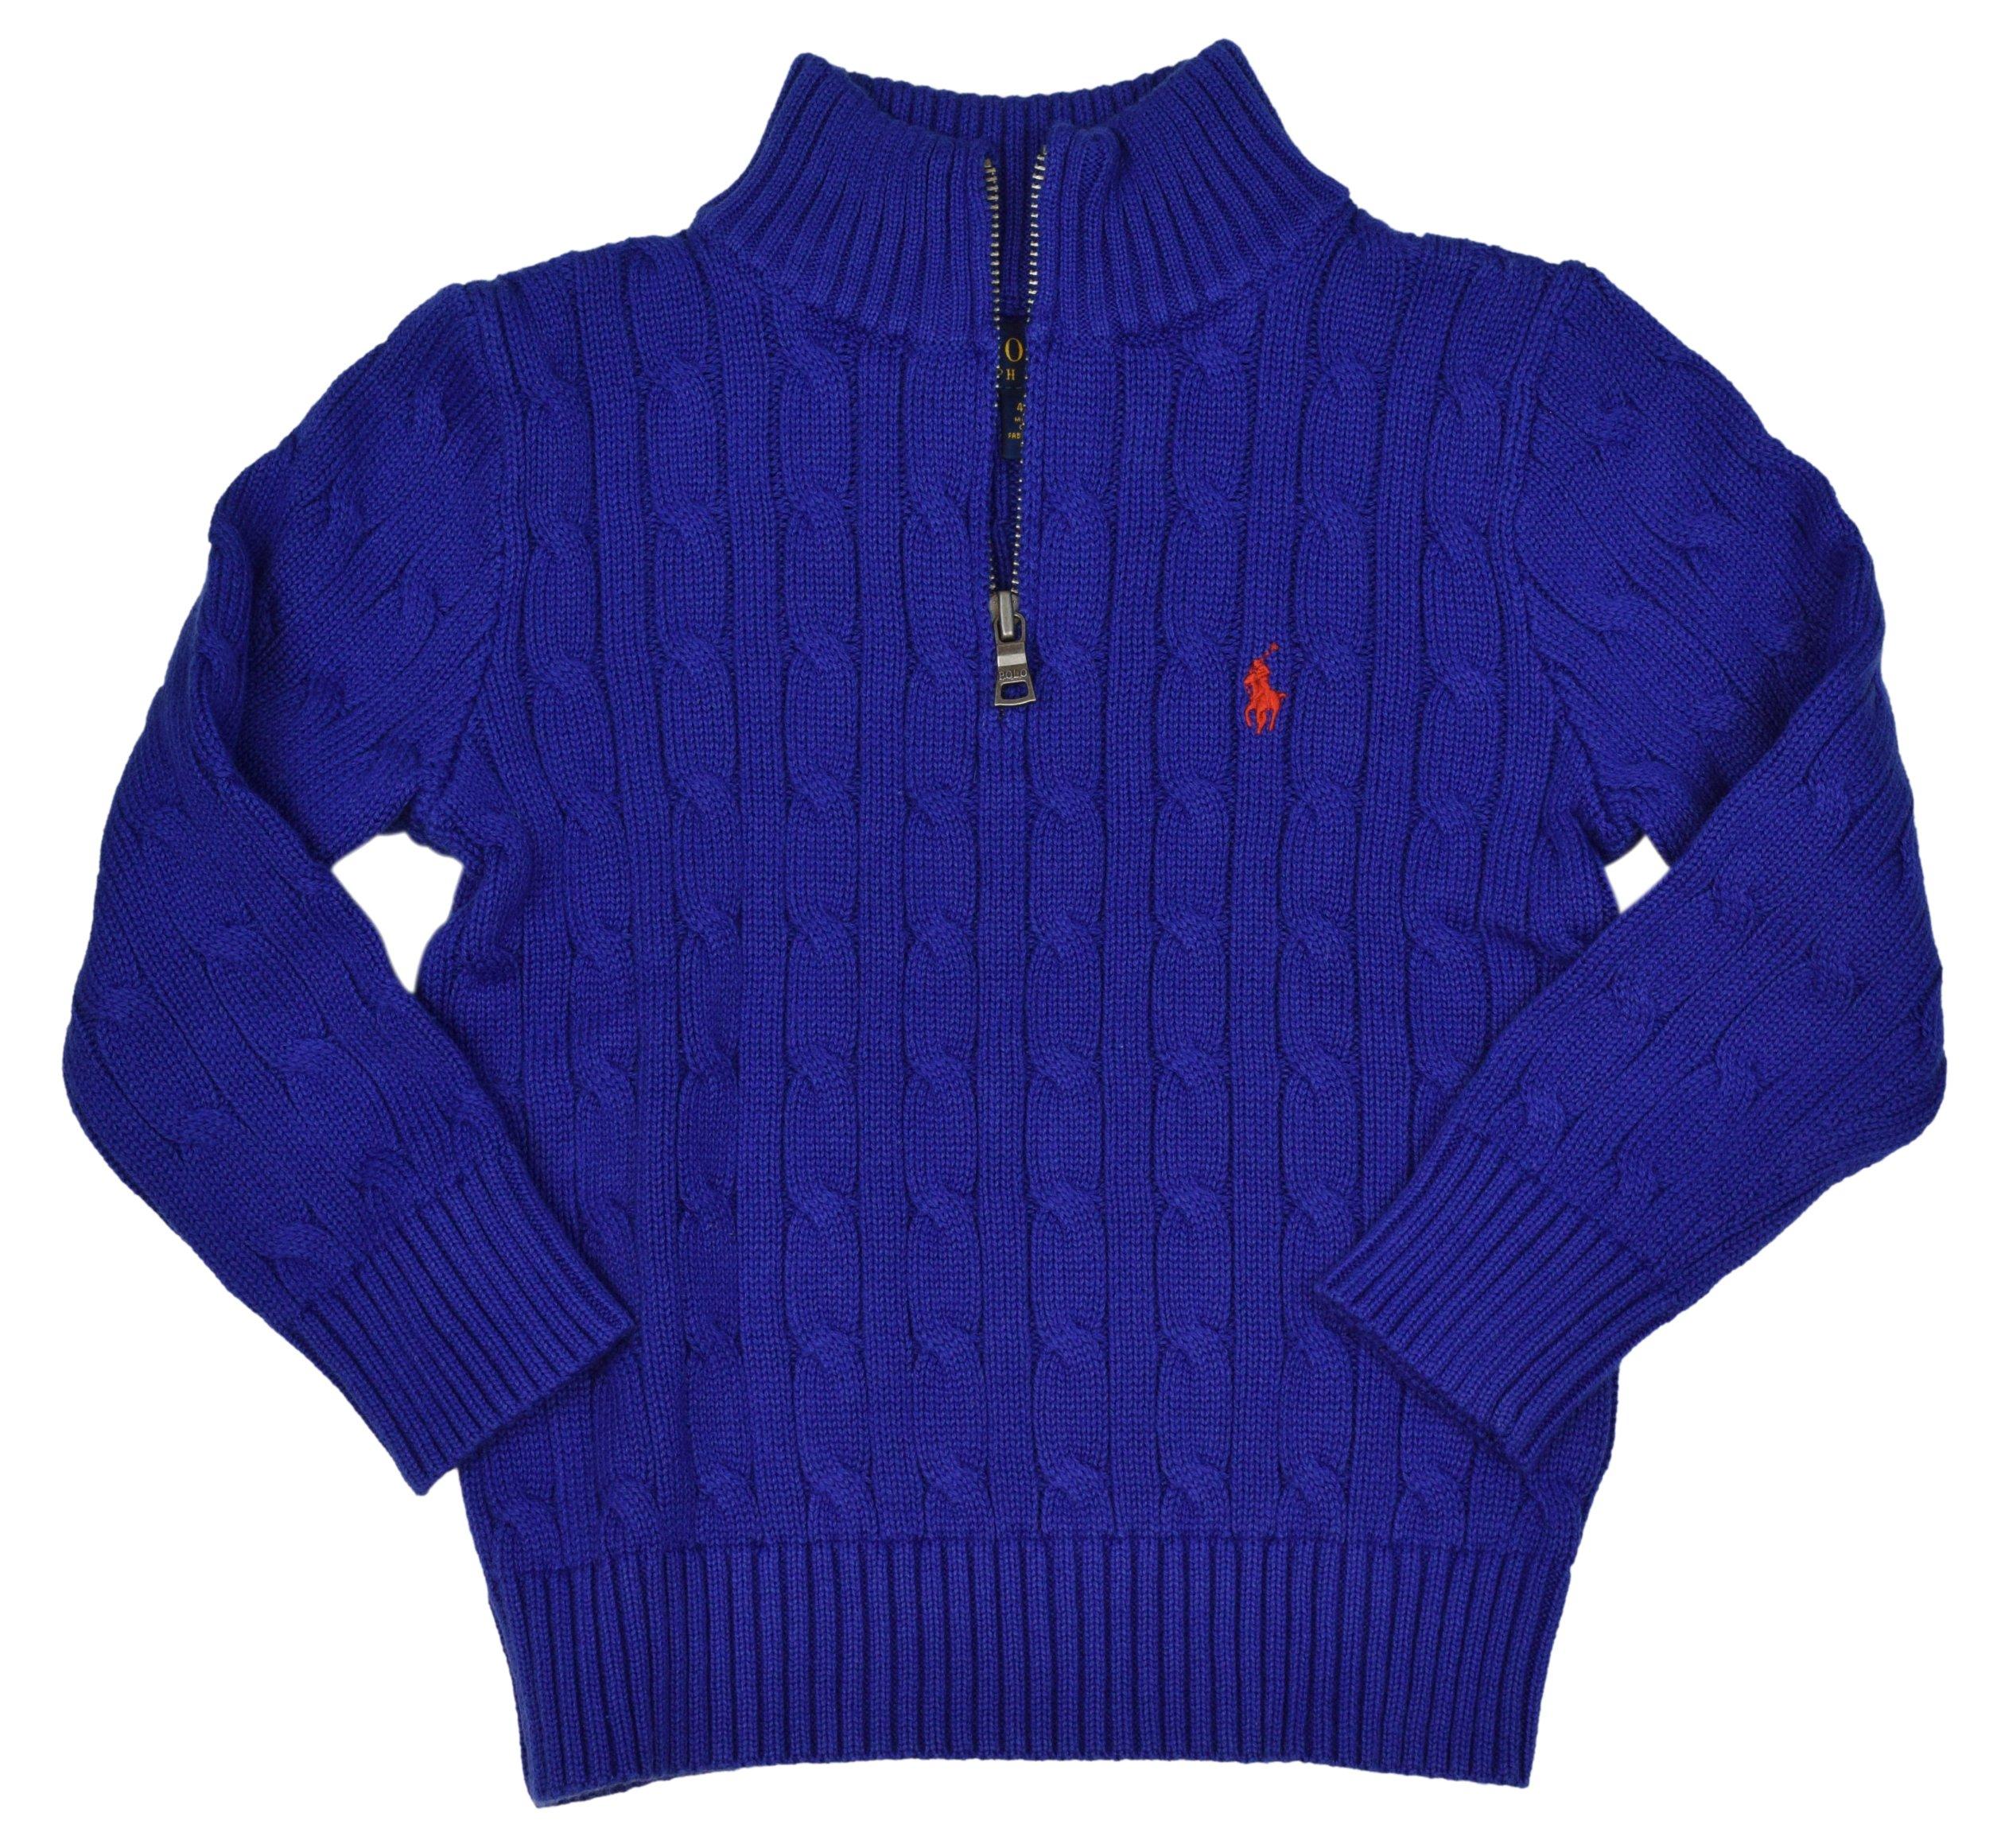 Polo Ralph Lauren Little Boys' Cable Knit 1/2 Zip Sweater - 2/2T - Bue